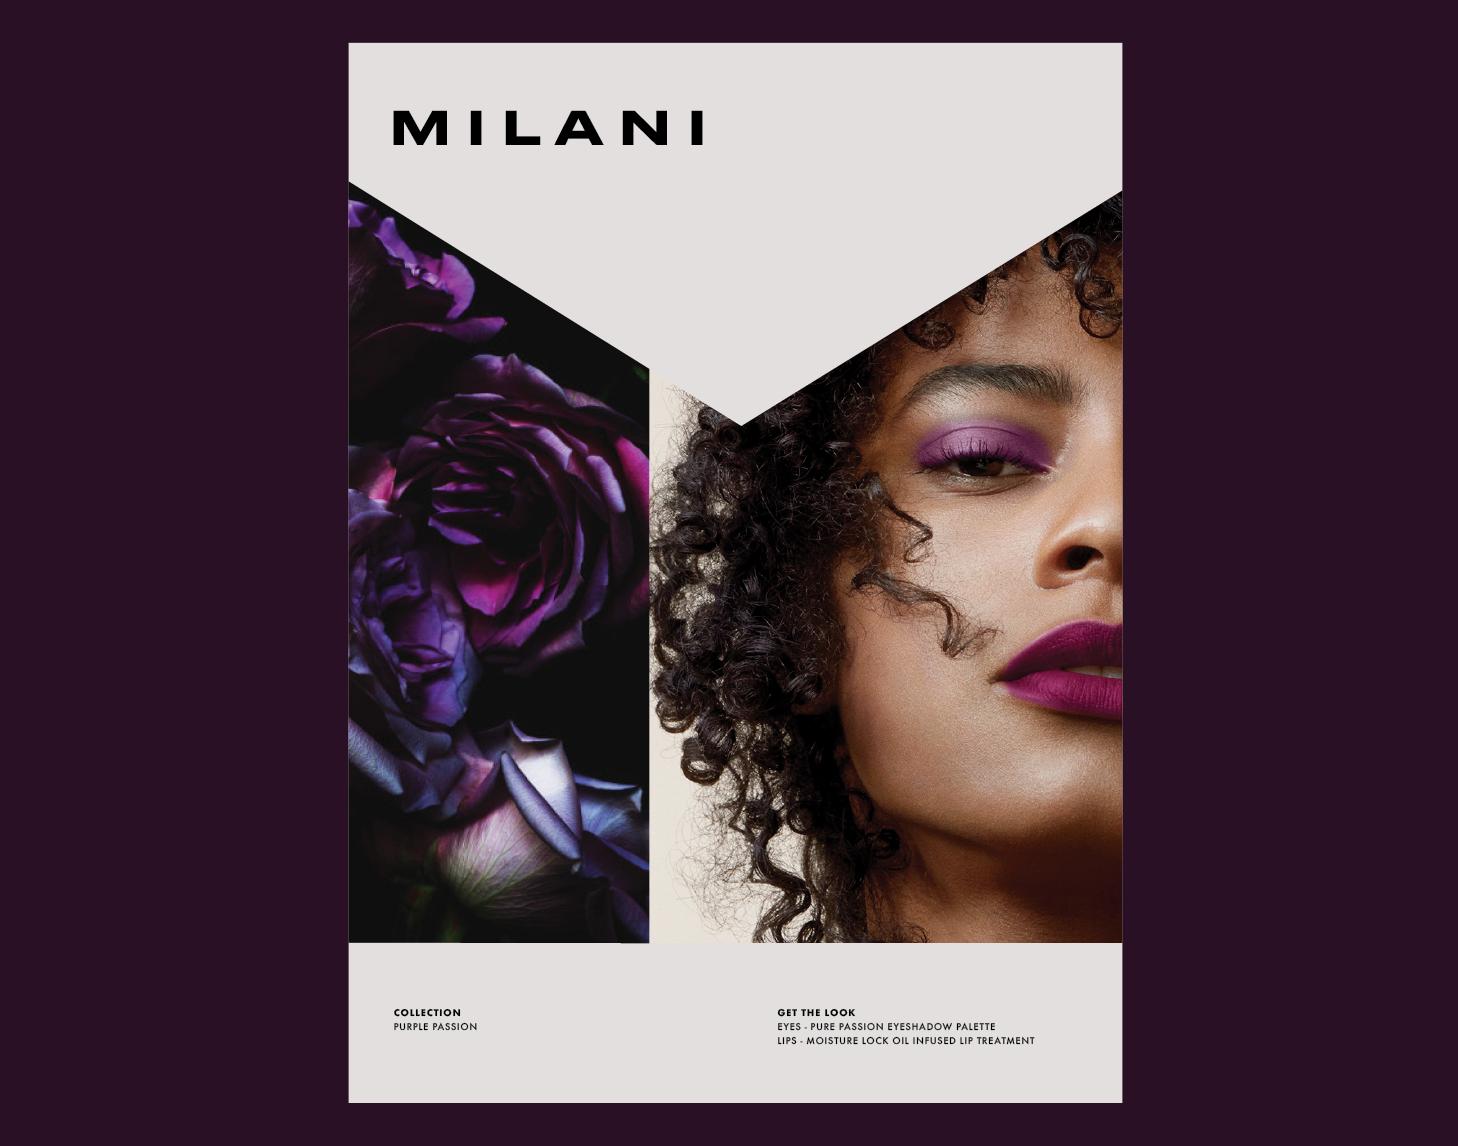 Milani Cosmetics graphic.png